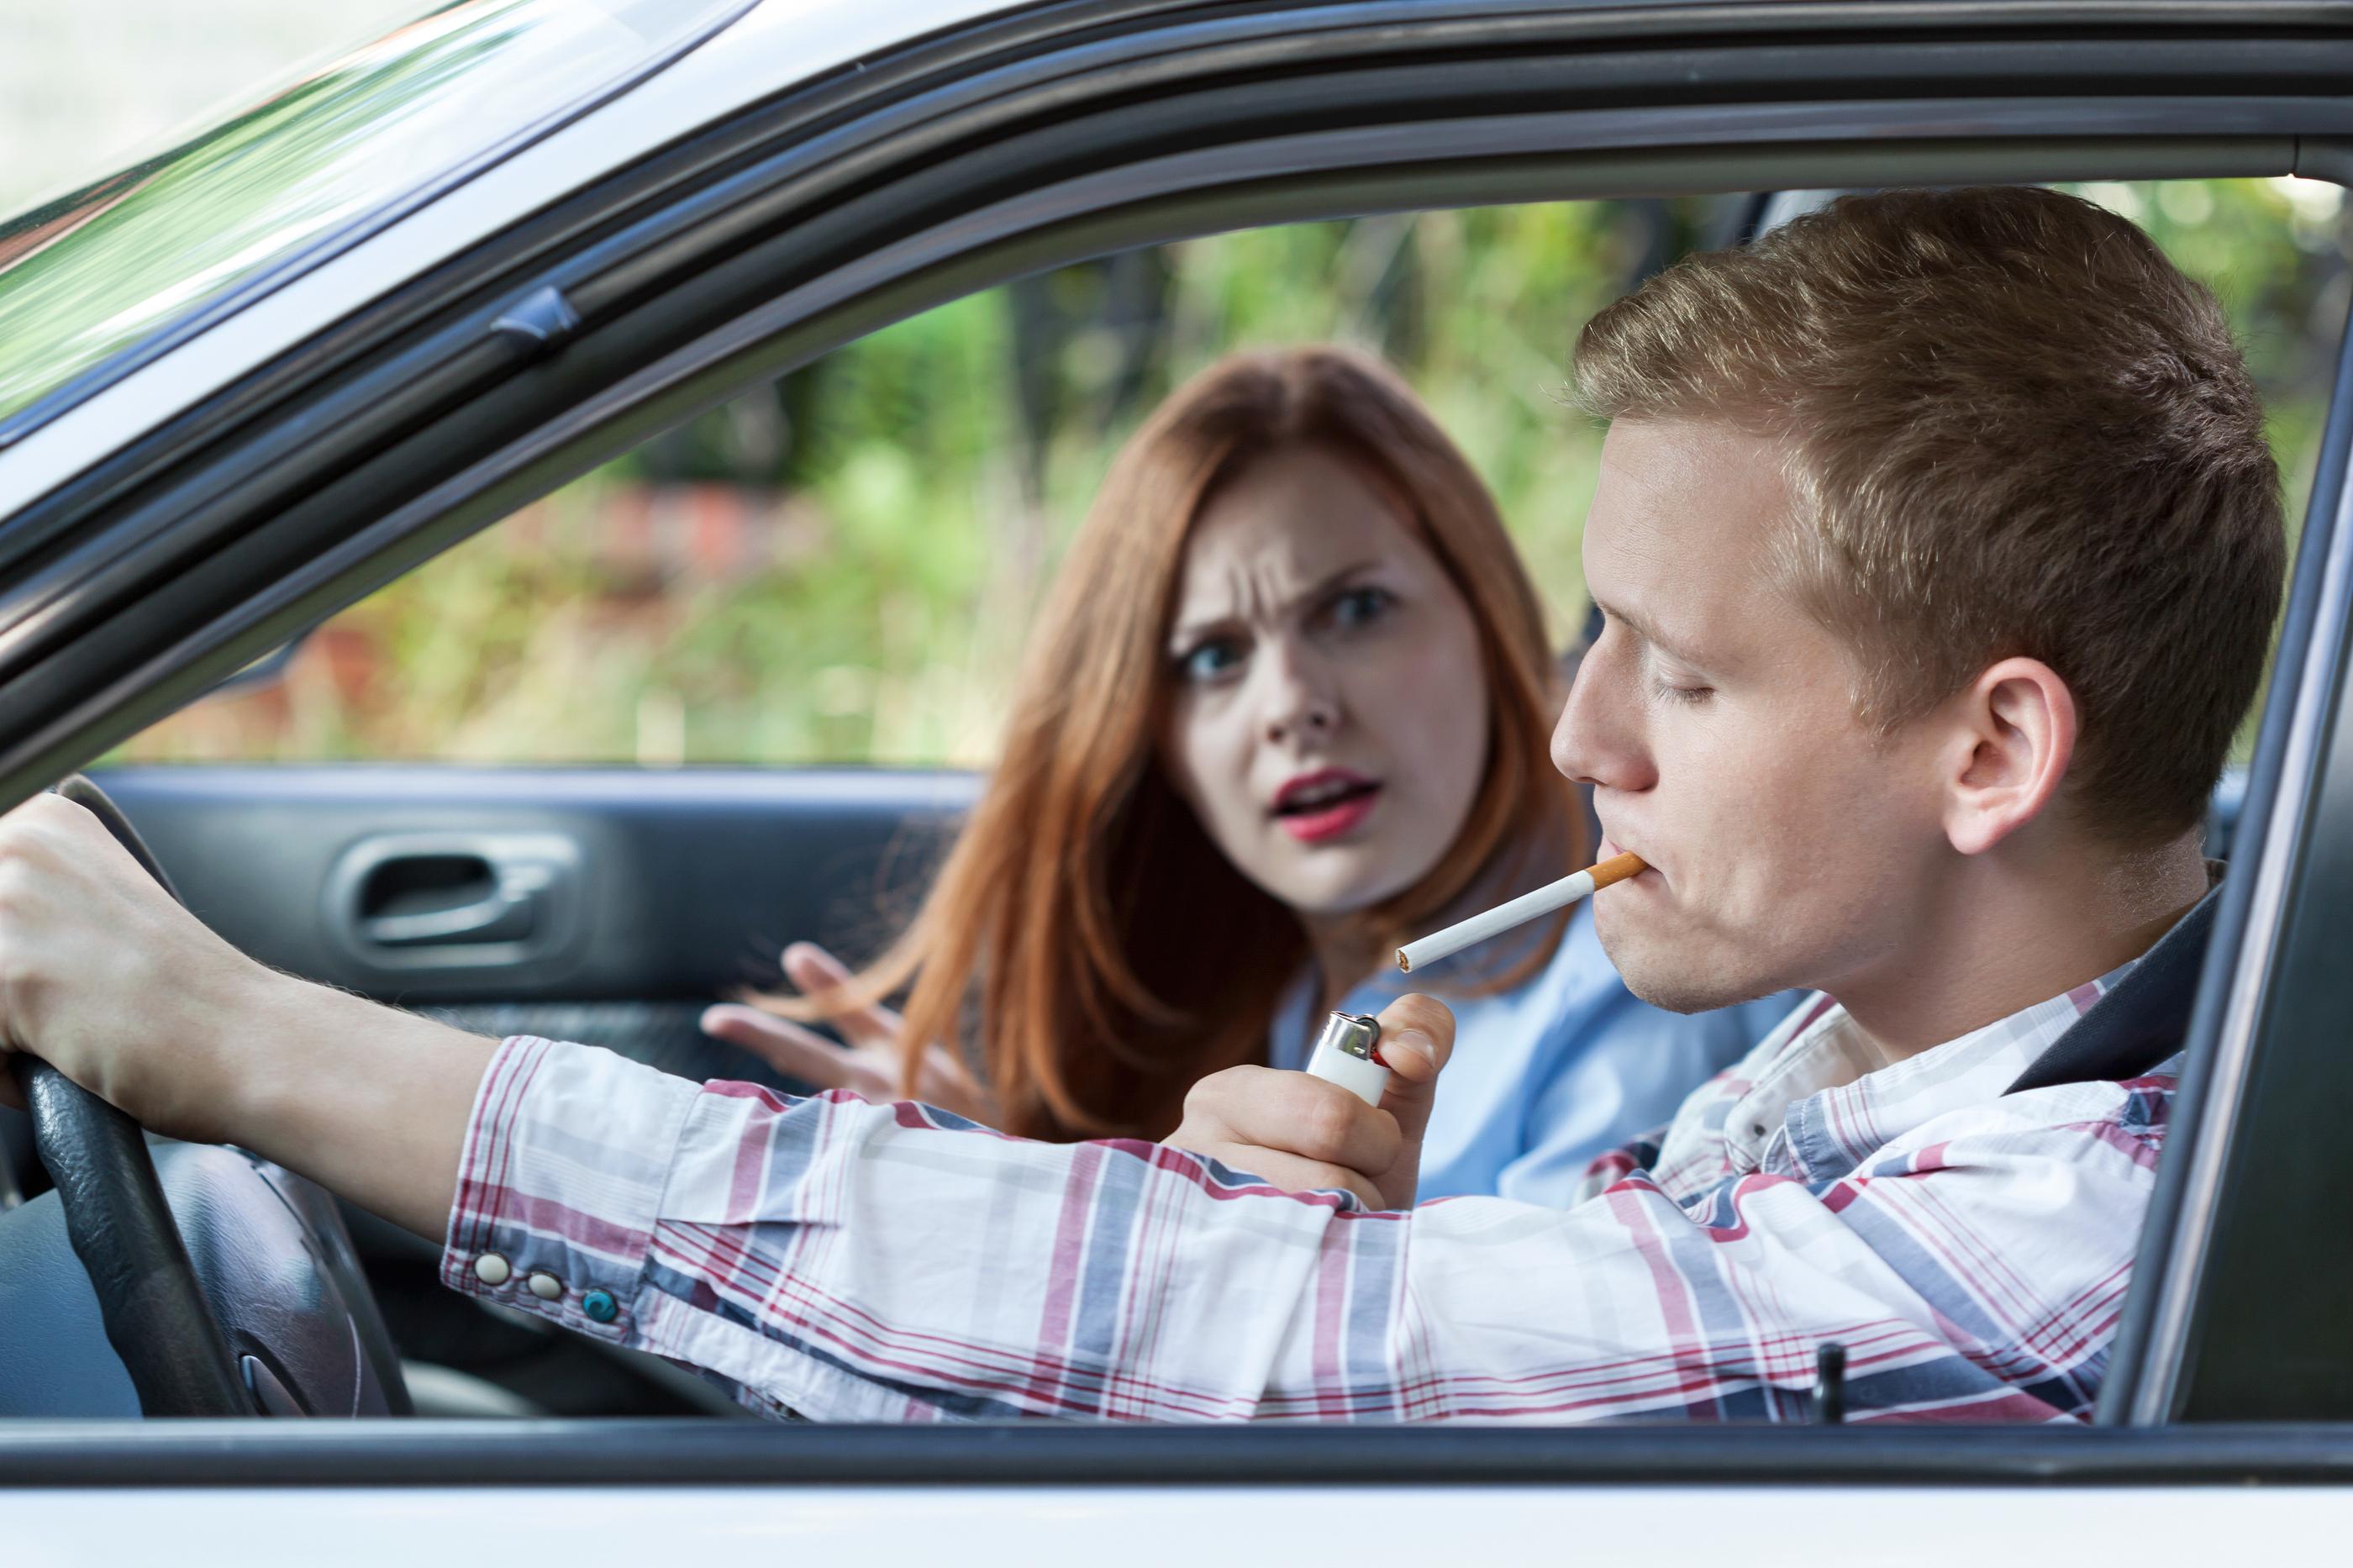 bigstock-couple-argue-over-car-smoking-76679582.jpg